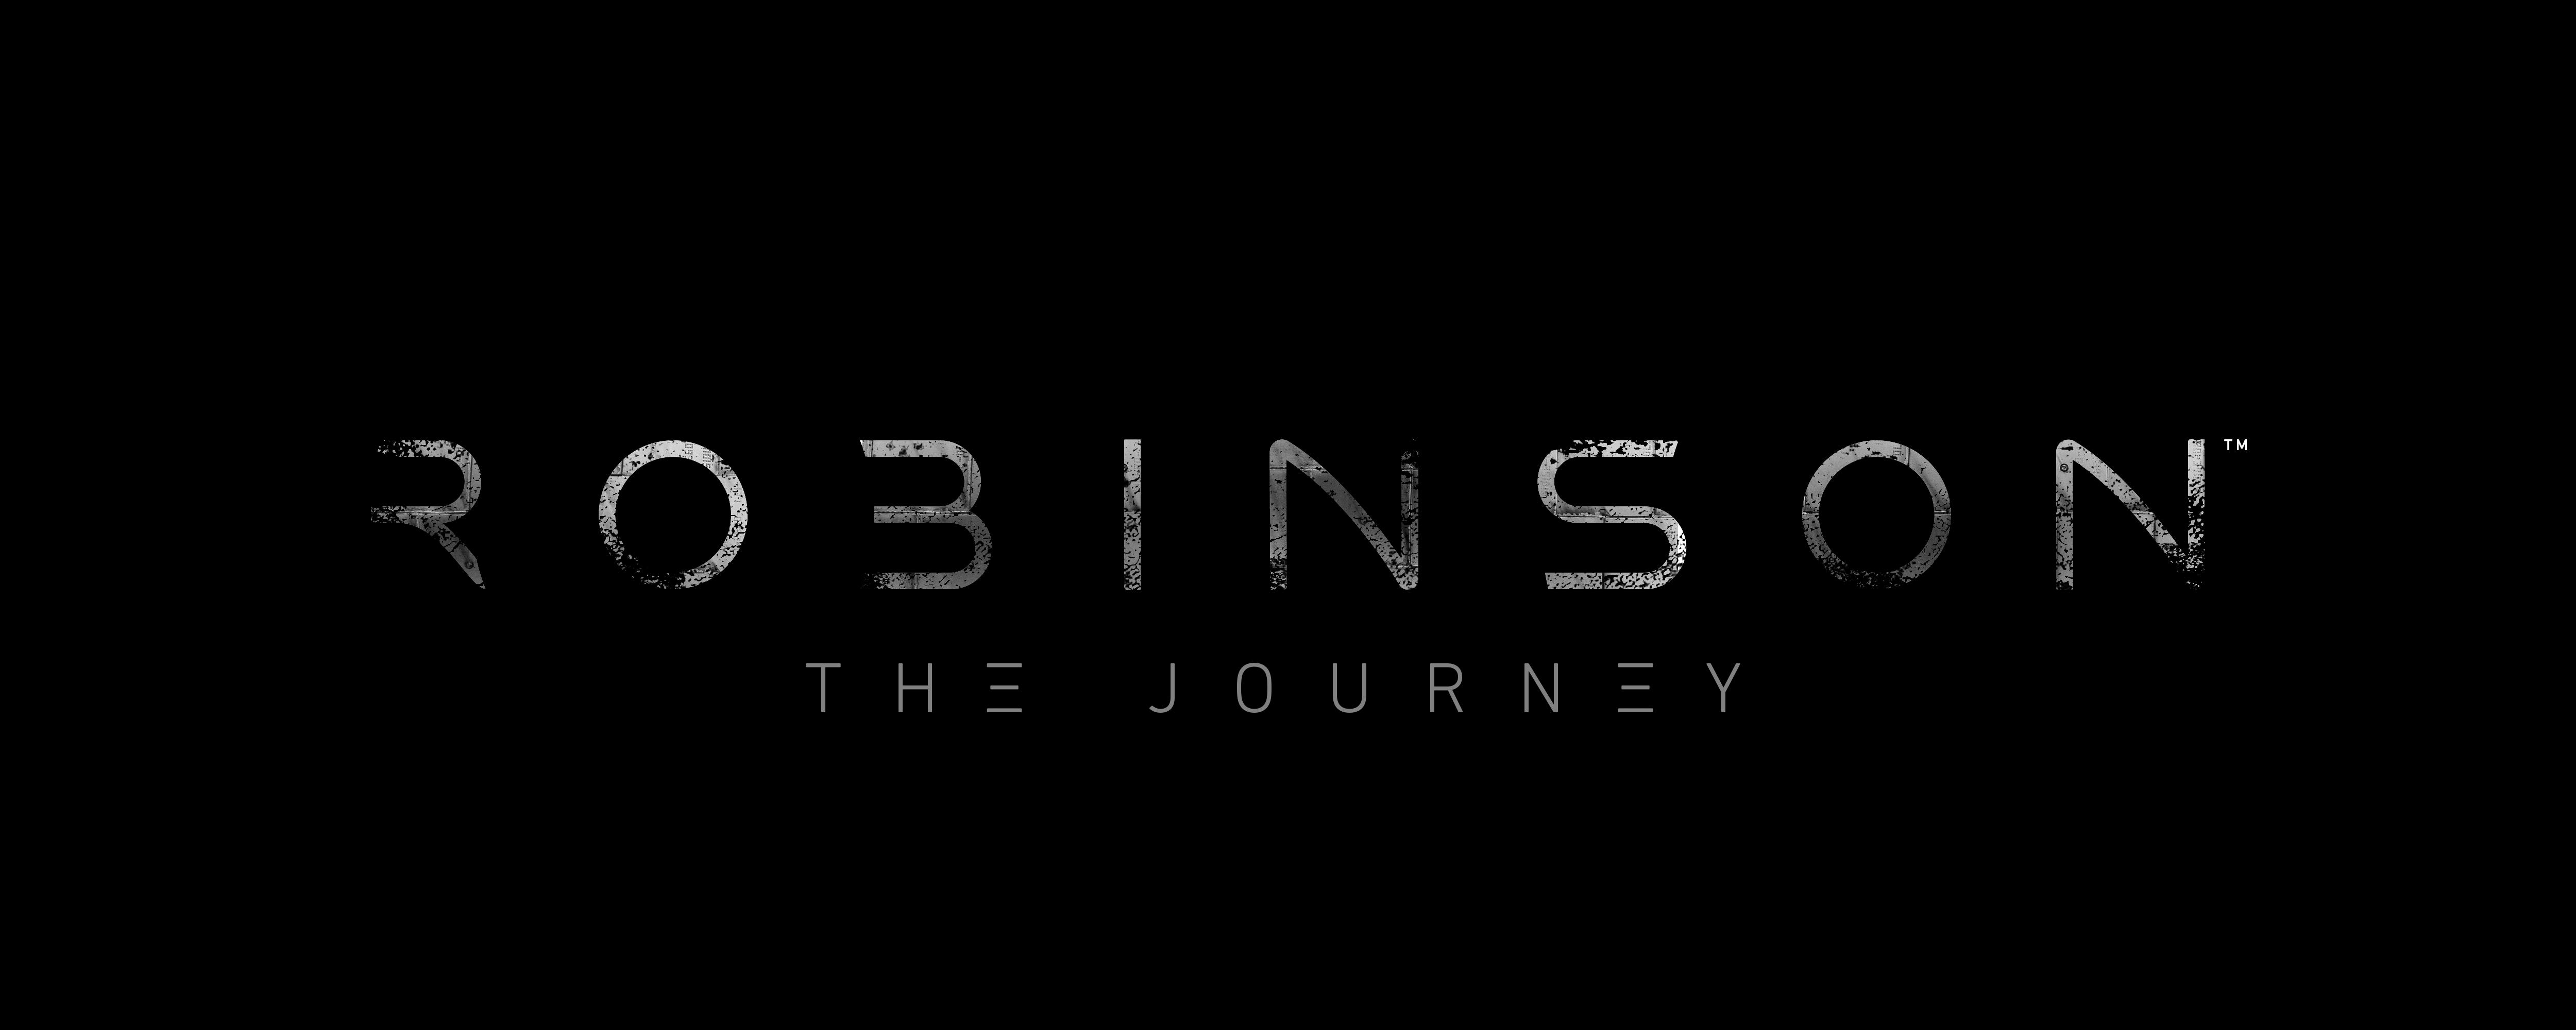 Robinson The Journey Logo